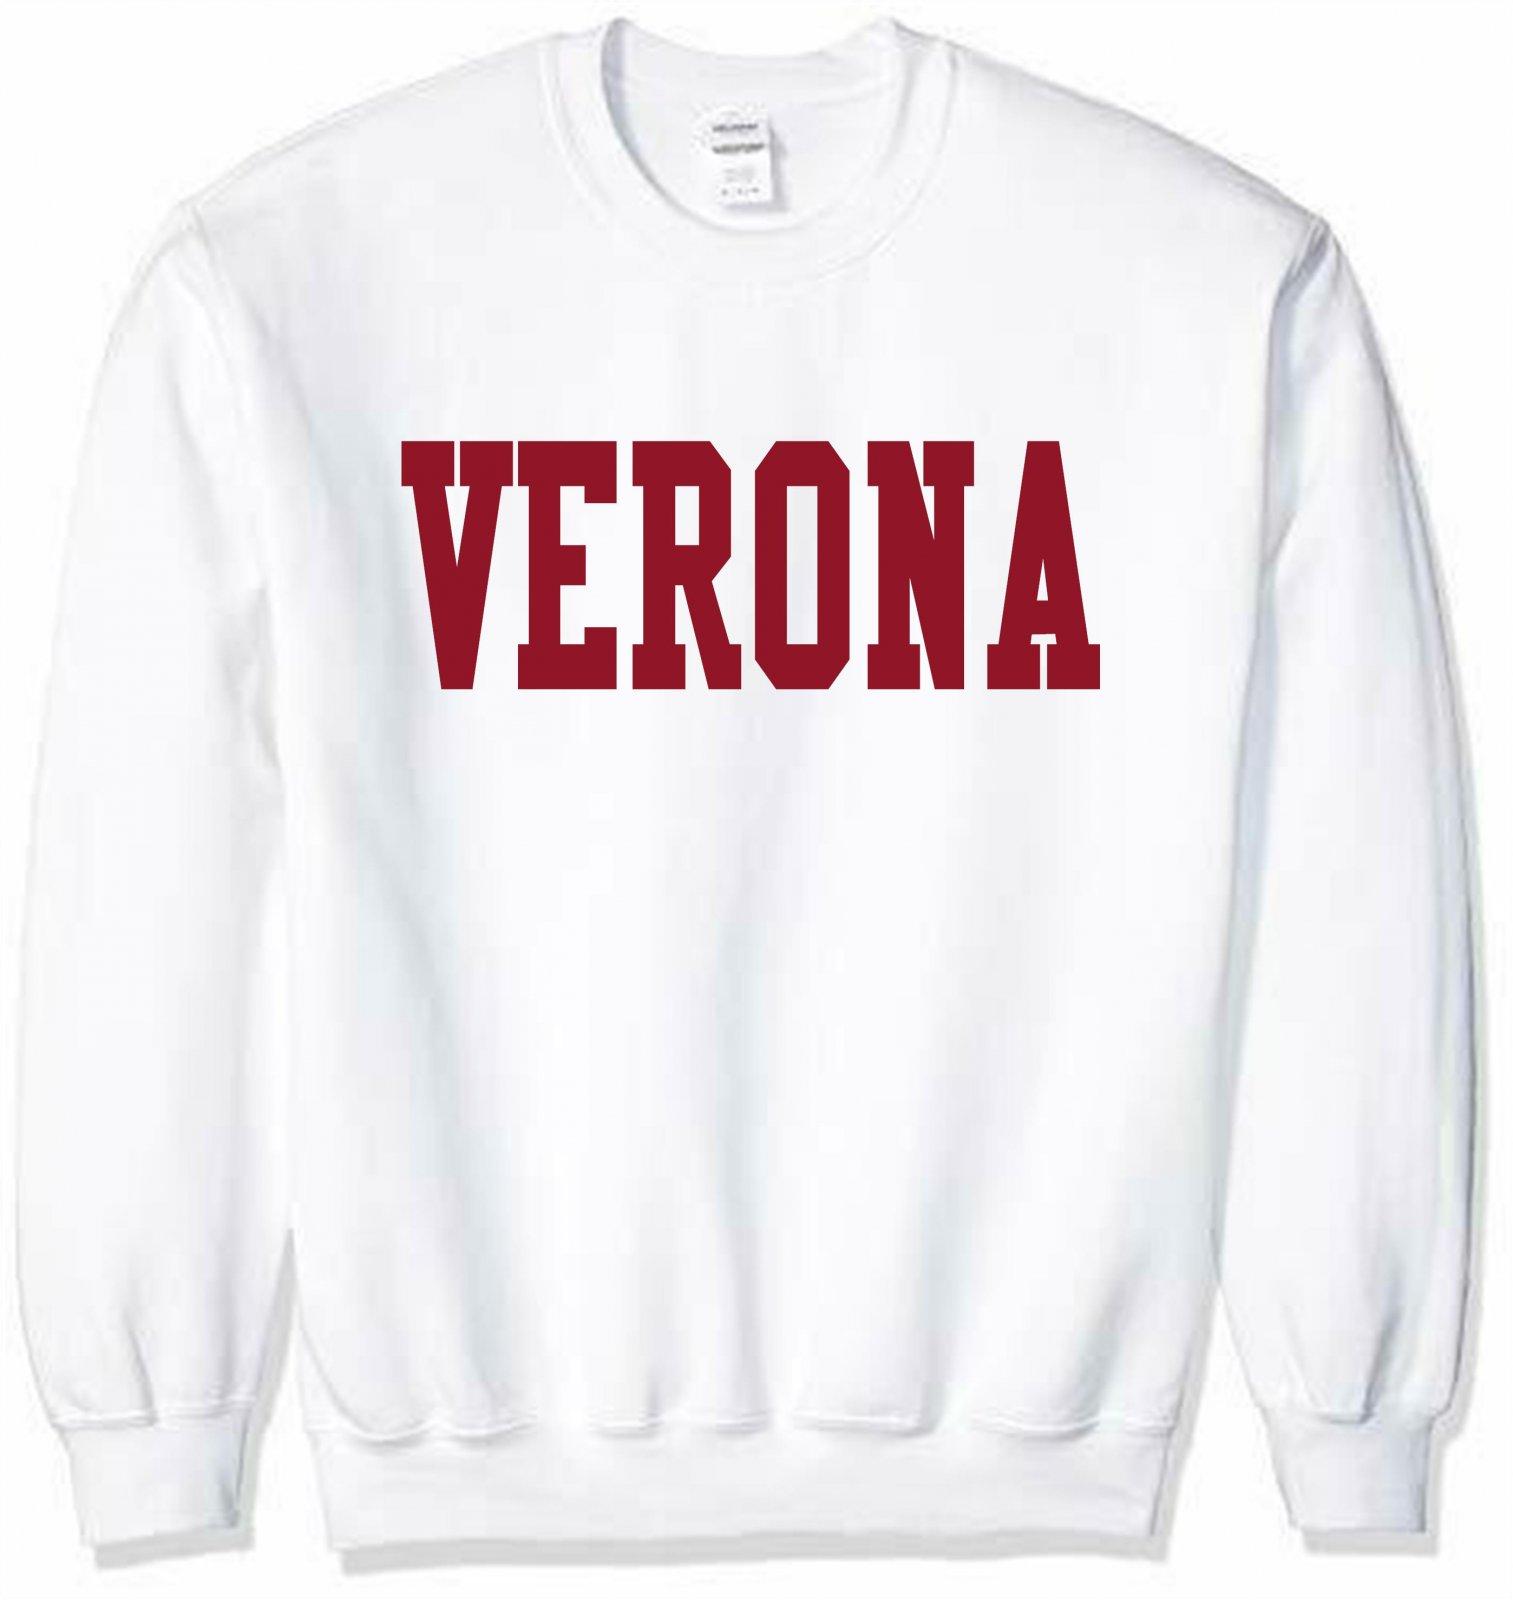 Verona Crewneck